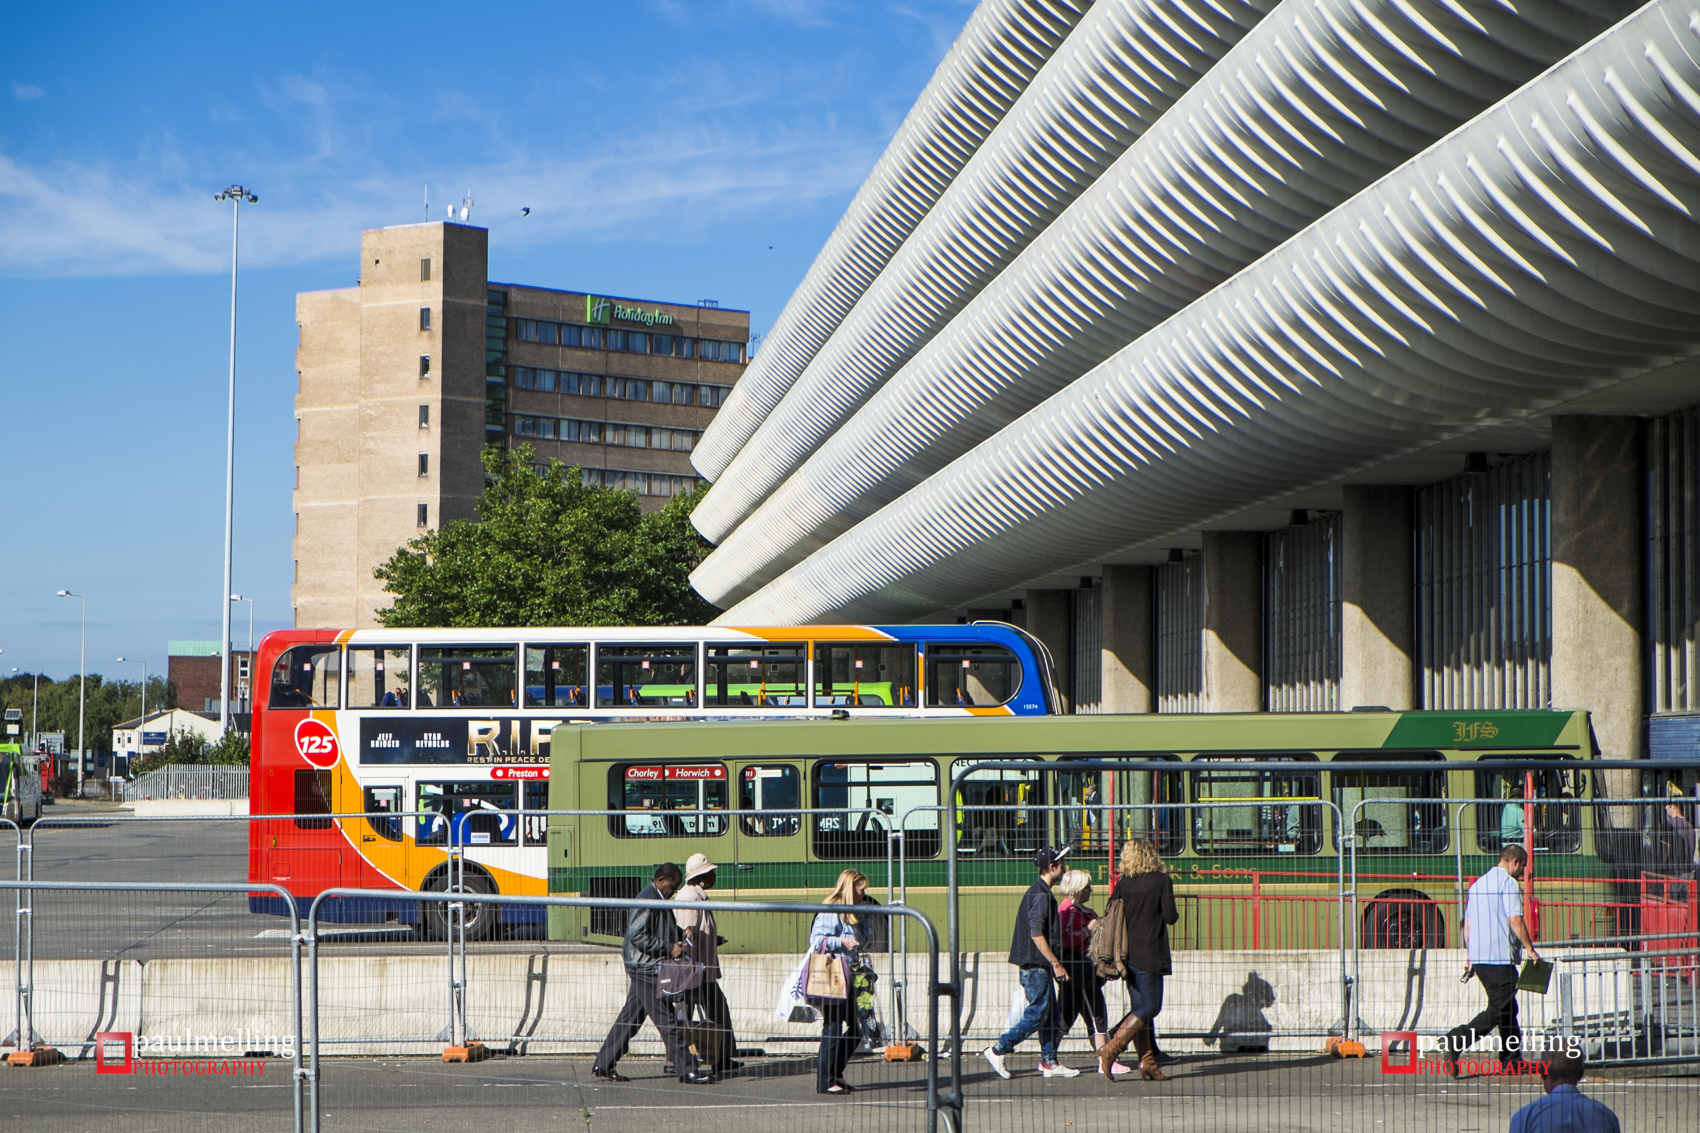 Bus Station2 27 Sep 13